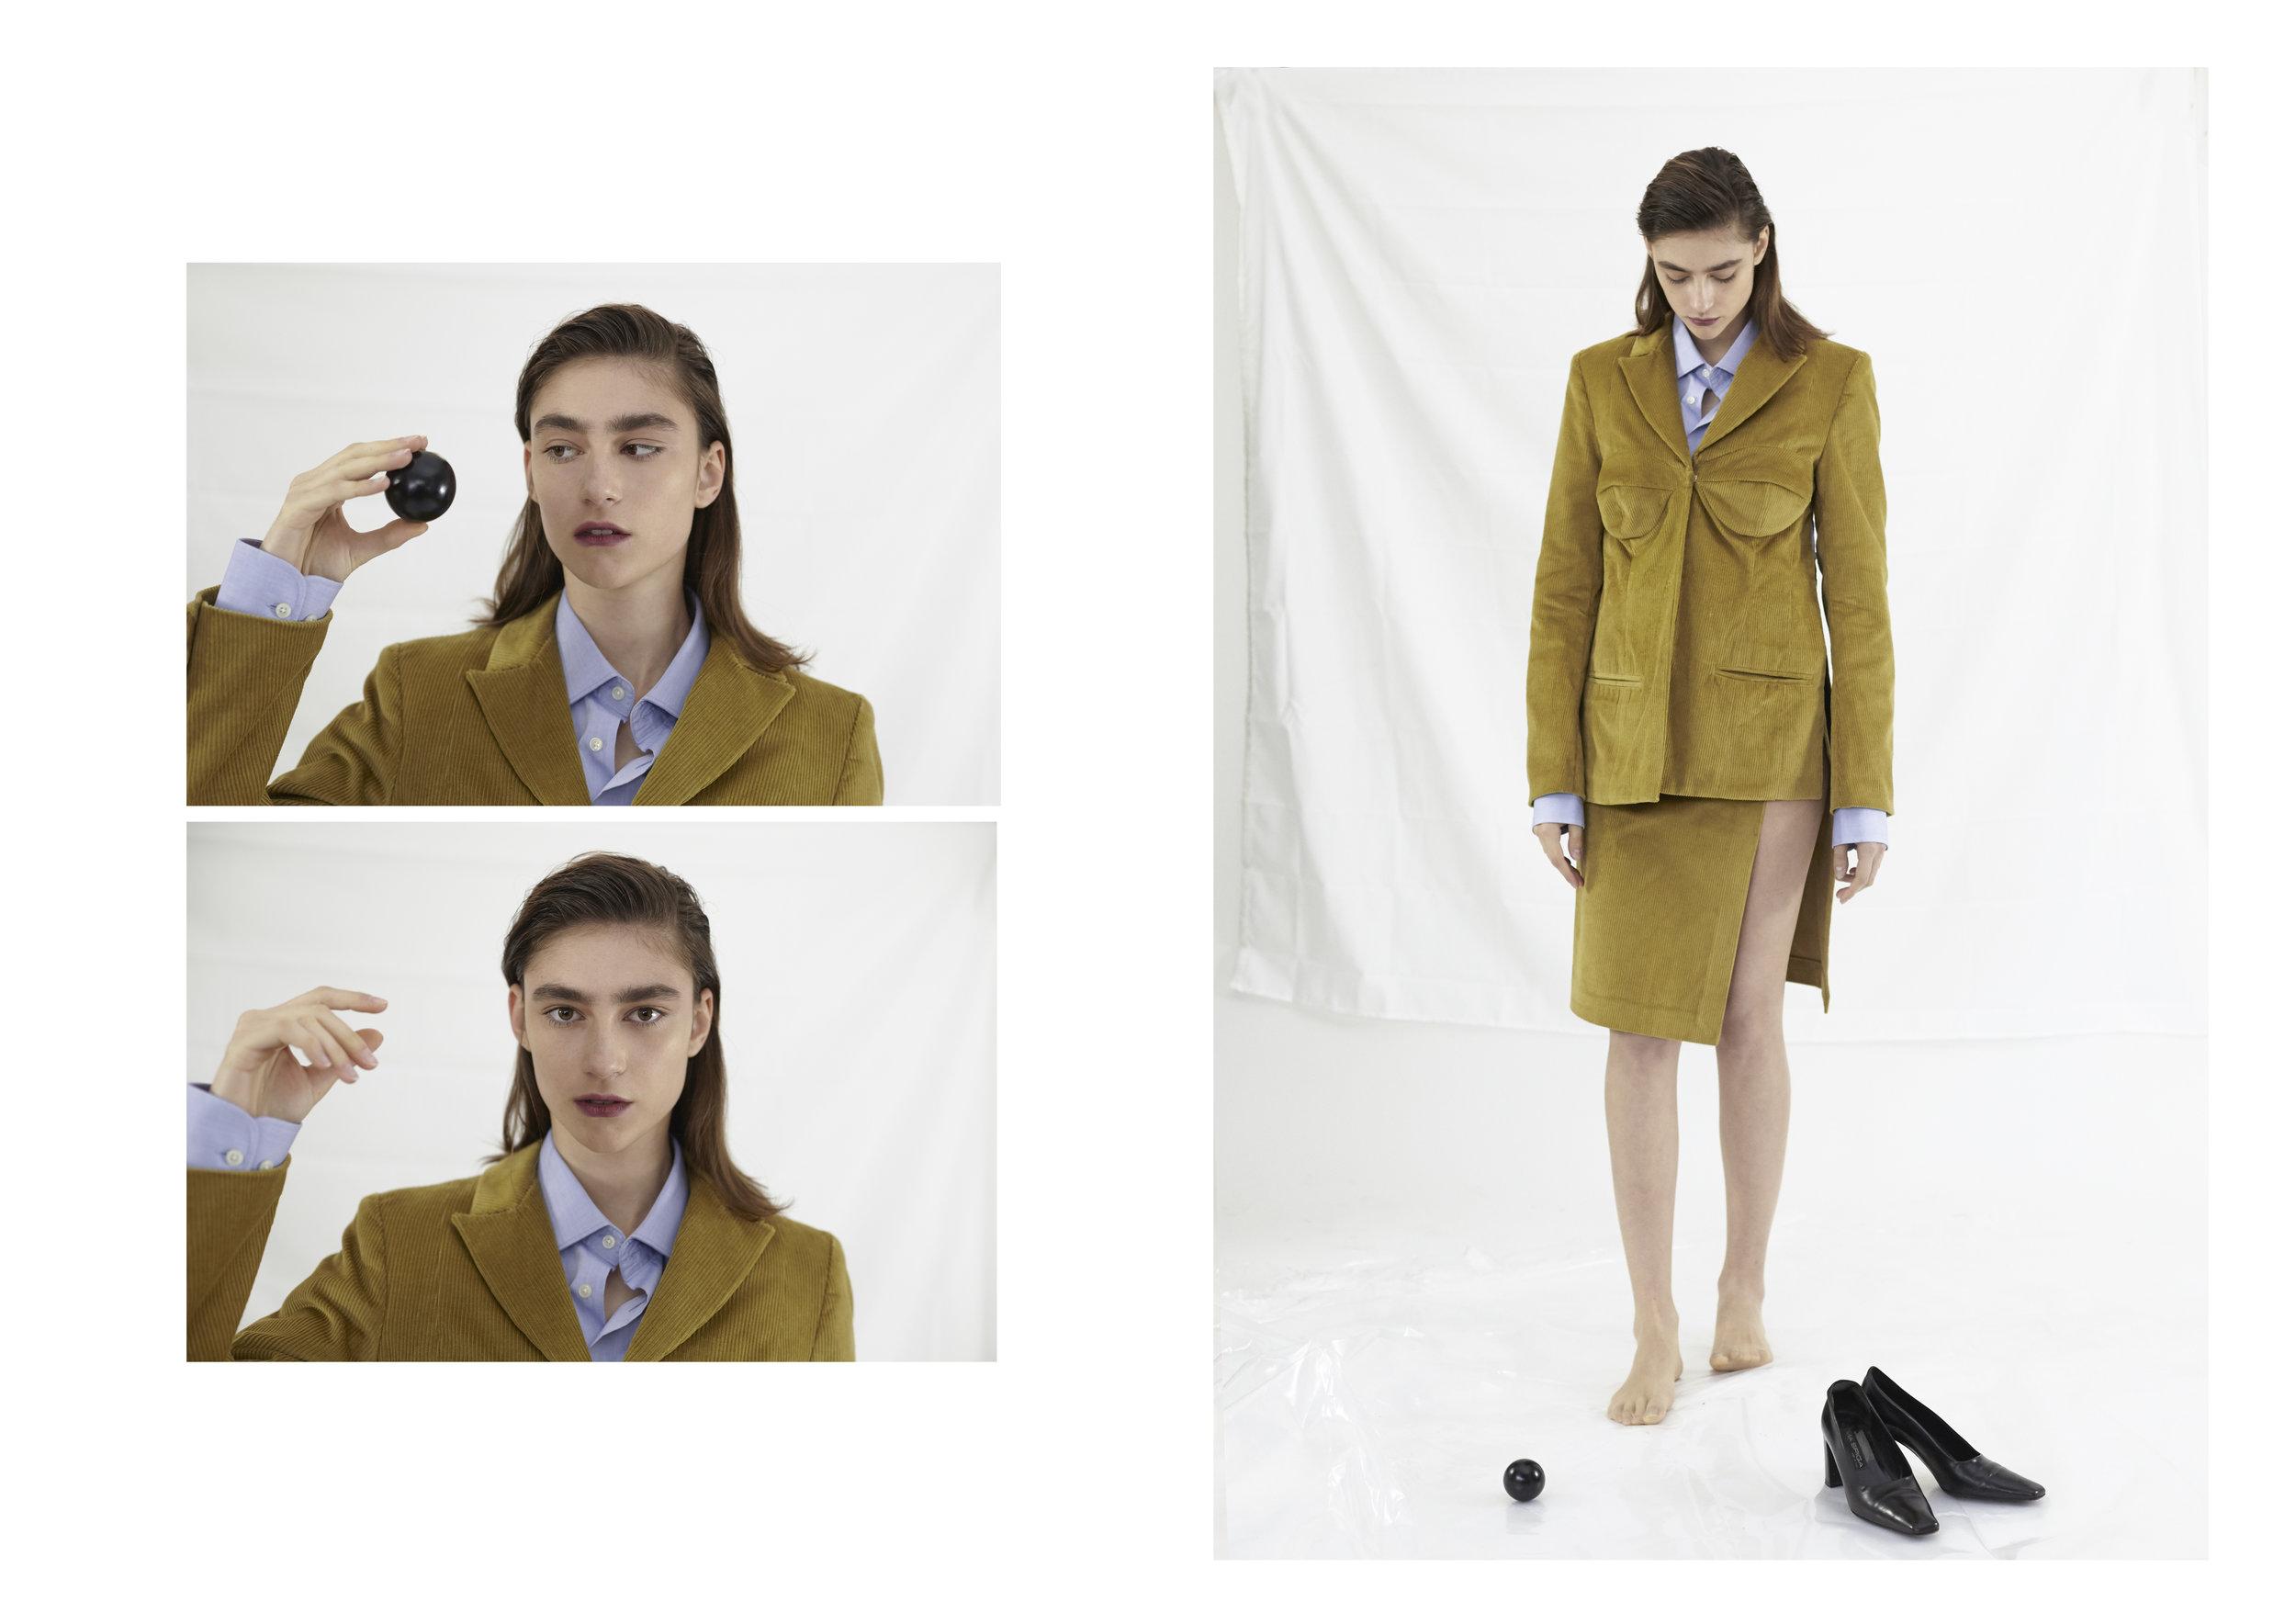 Federico Cina Tailleur, Stylist's Own Shirt, Vintage Shoes